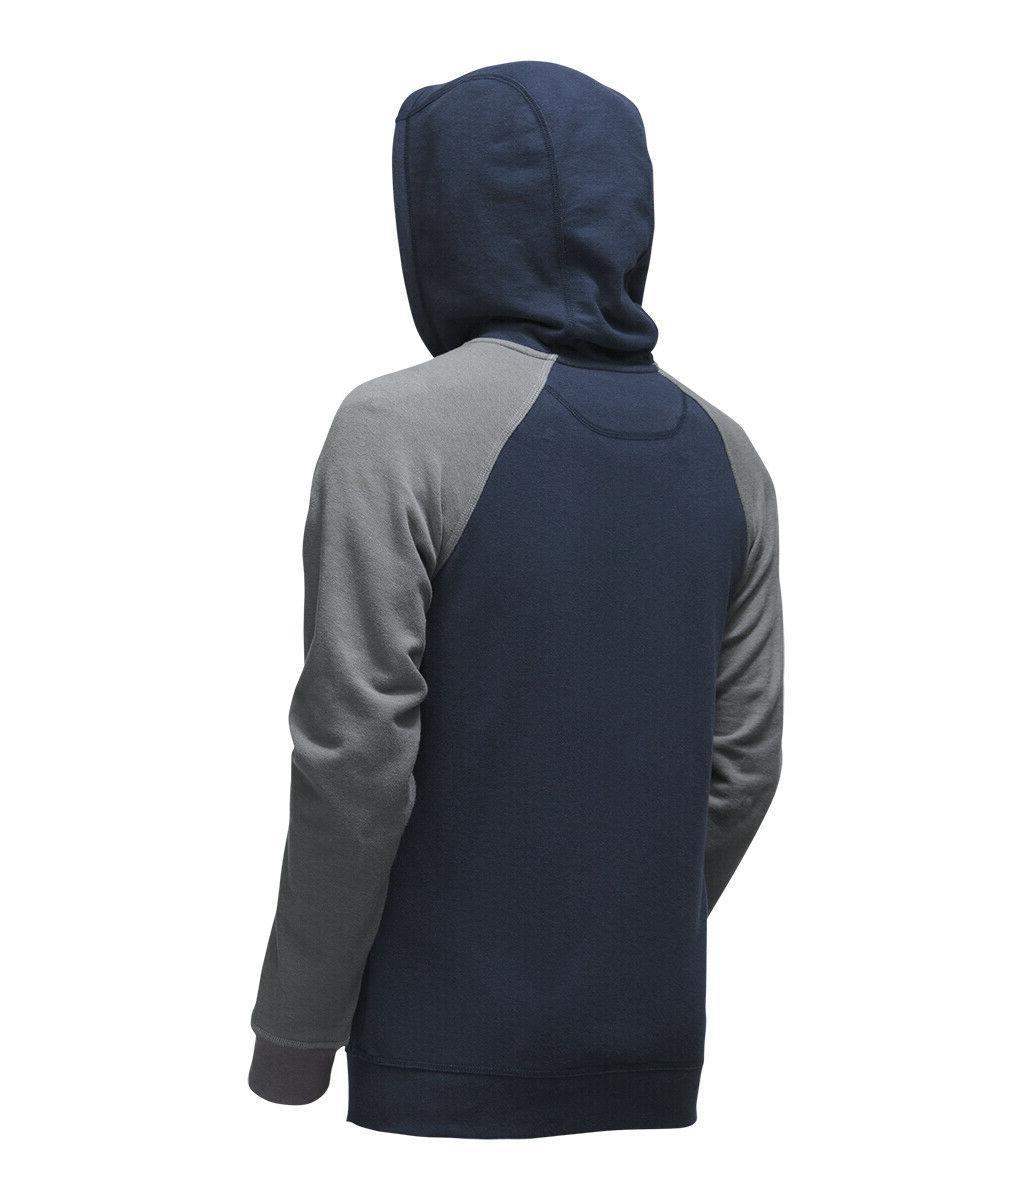 The Men's Wicker FlashDry French Jacket New